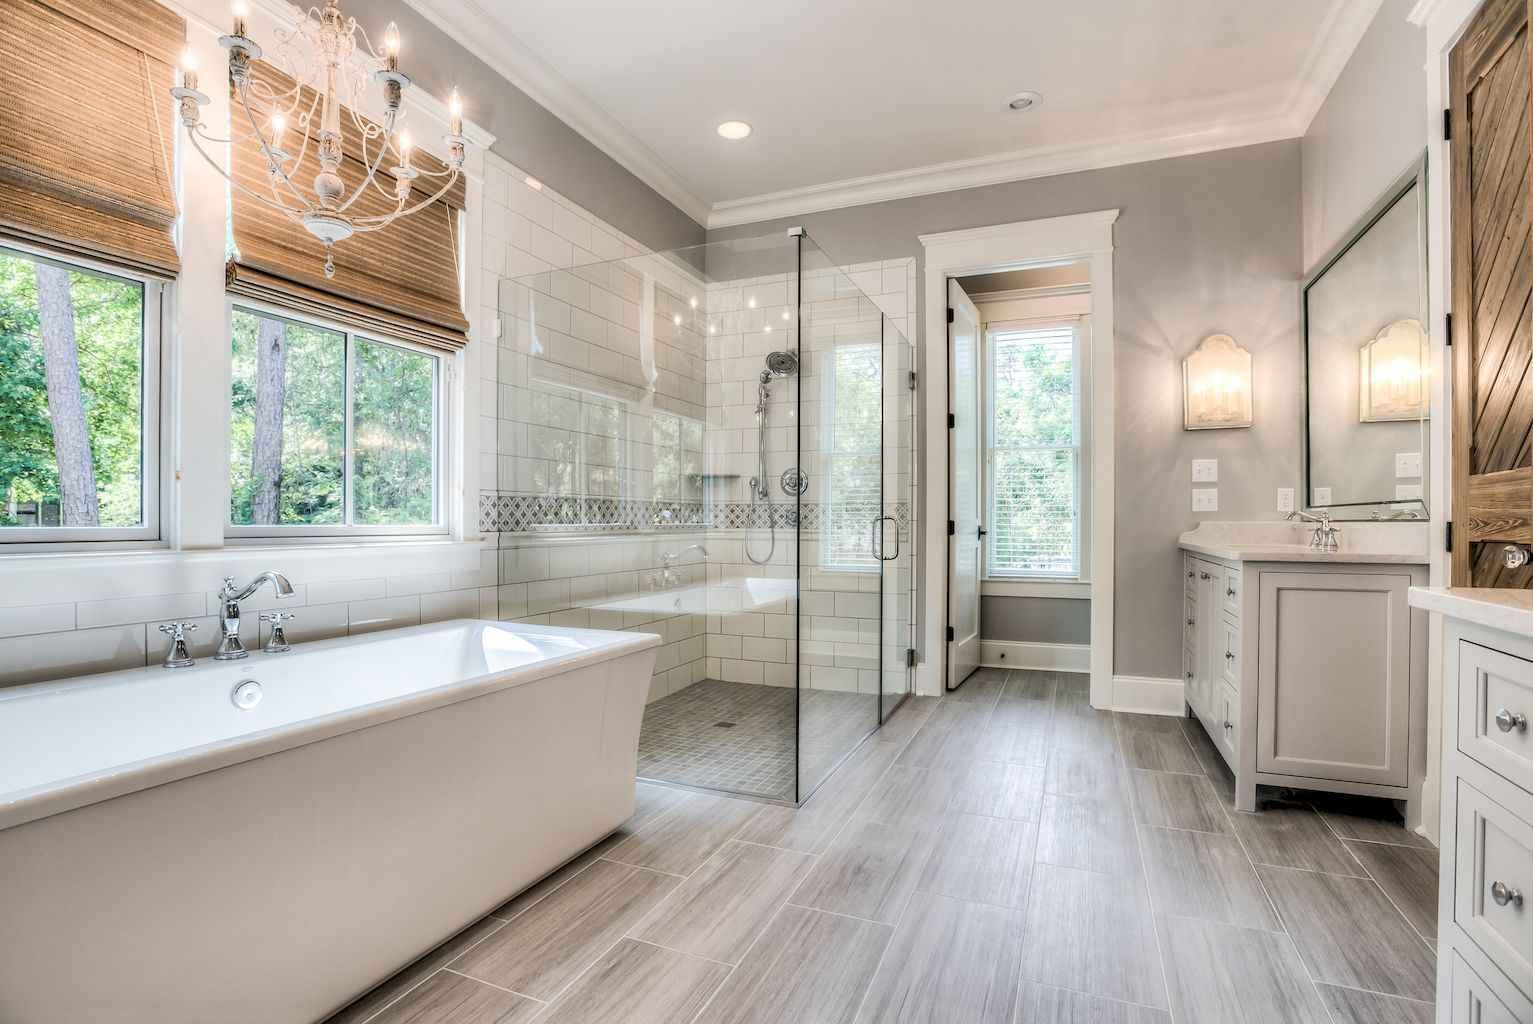 Rustic farmhouse master bathroom remodel ideas 63 for Master bathroom farmhouse